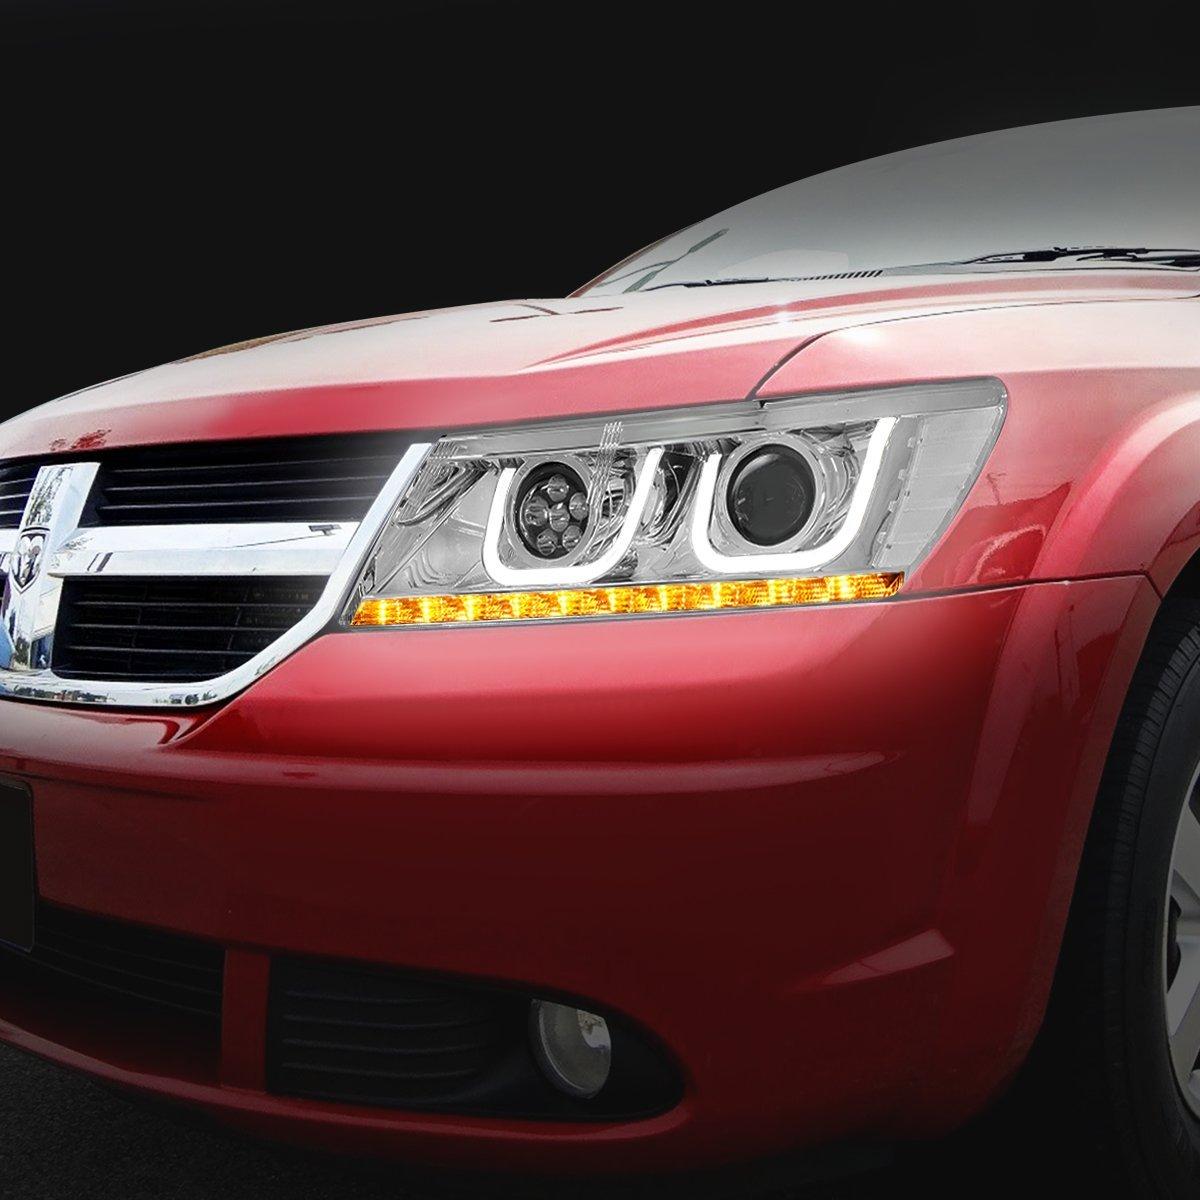 DNA Motoring HL-JOURNER09-C-CK Pair of LED DRL+Turn Signal Projector Headlight For 09-17 Dodge Journey